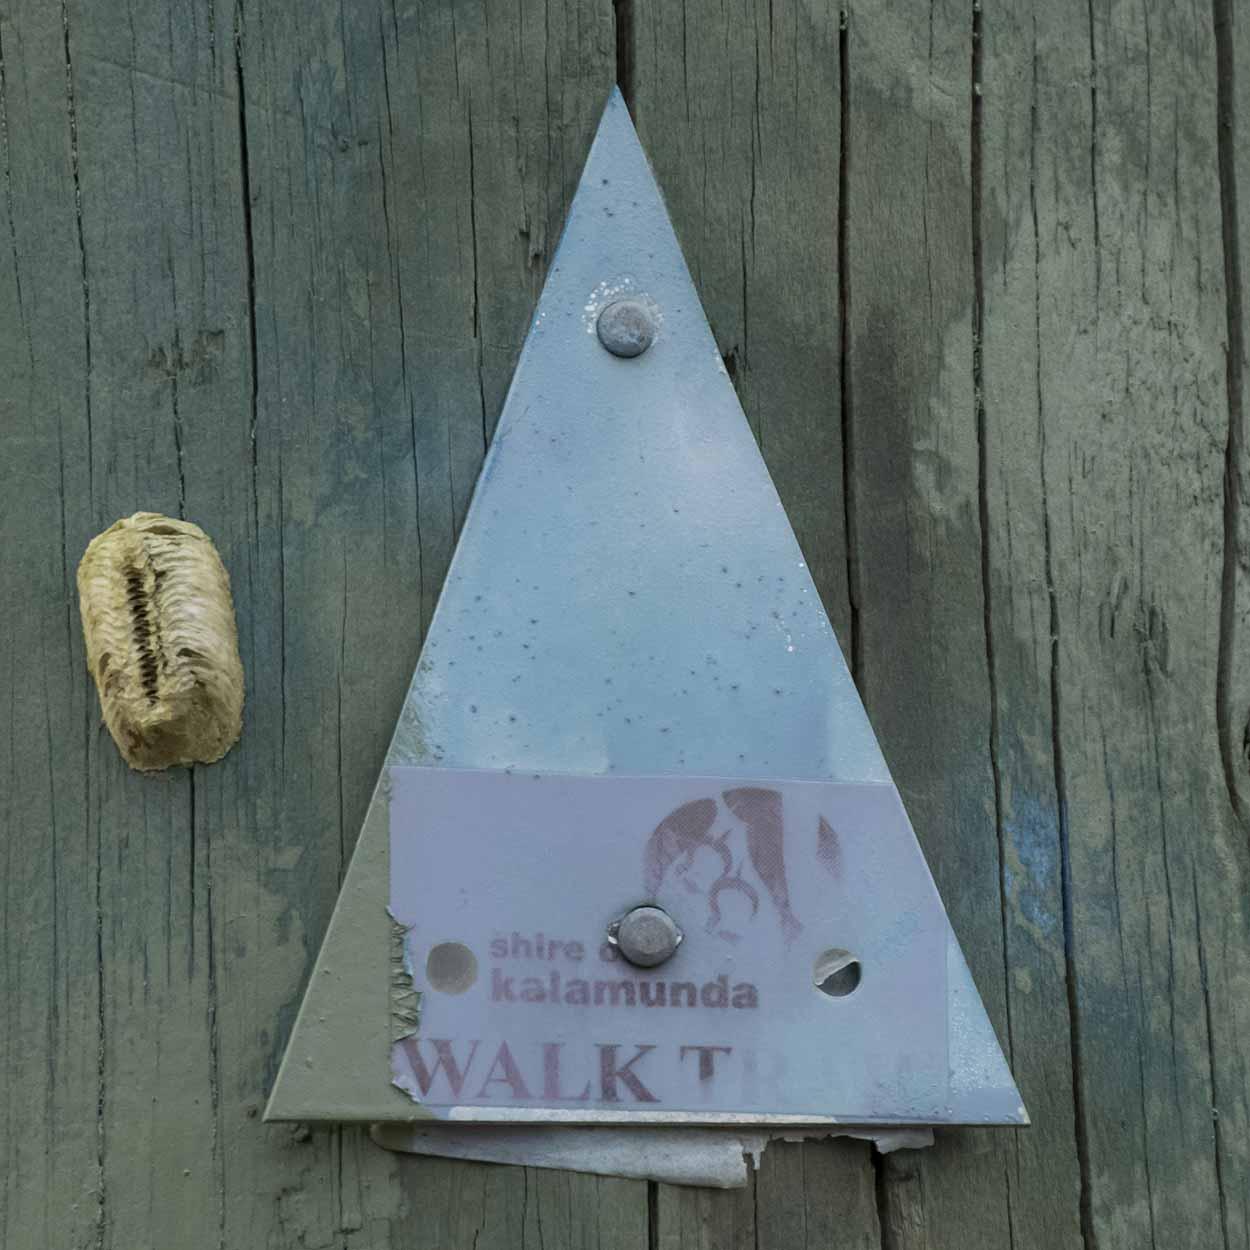 Mauve trail marker for the West Terrace Walk, Mundy Regional Park, Perth, Western Australia